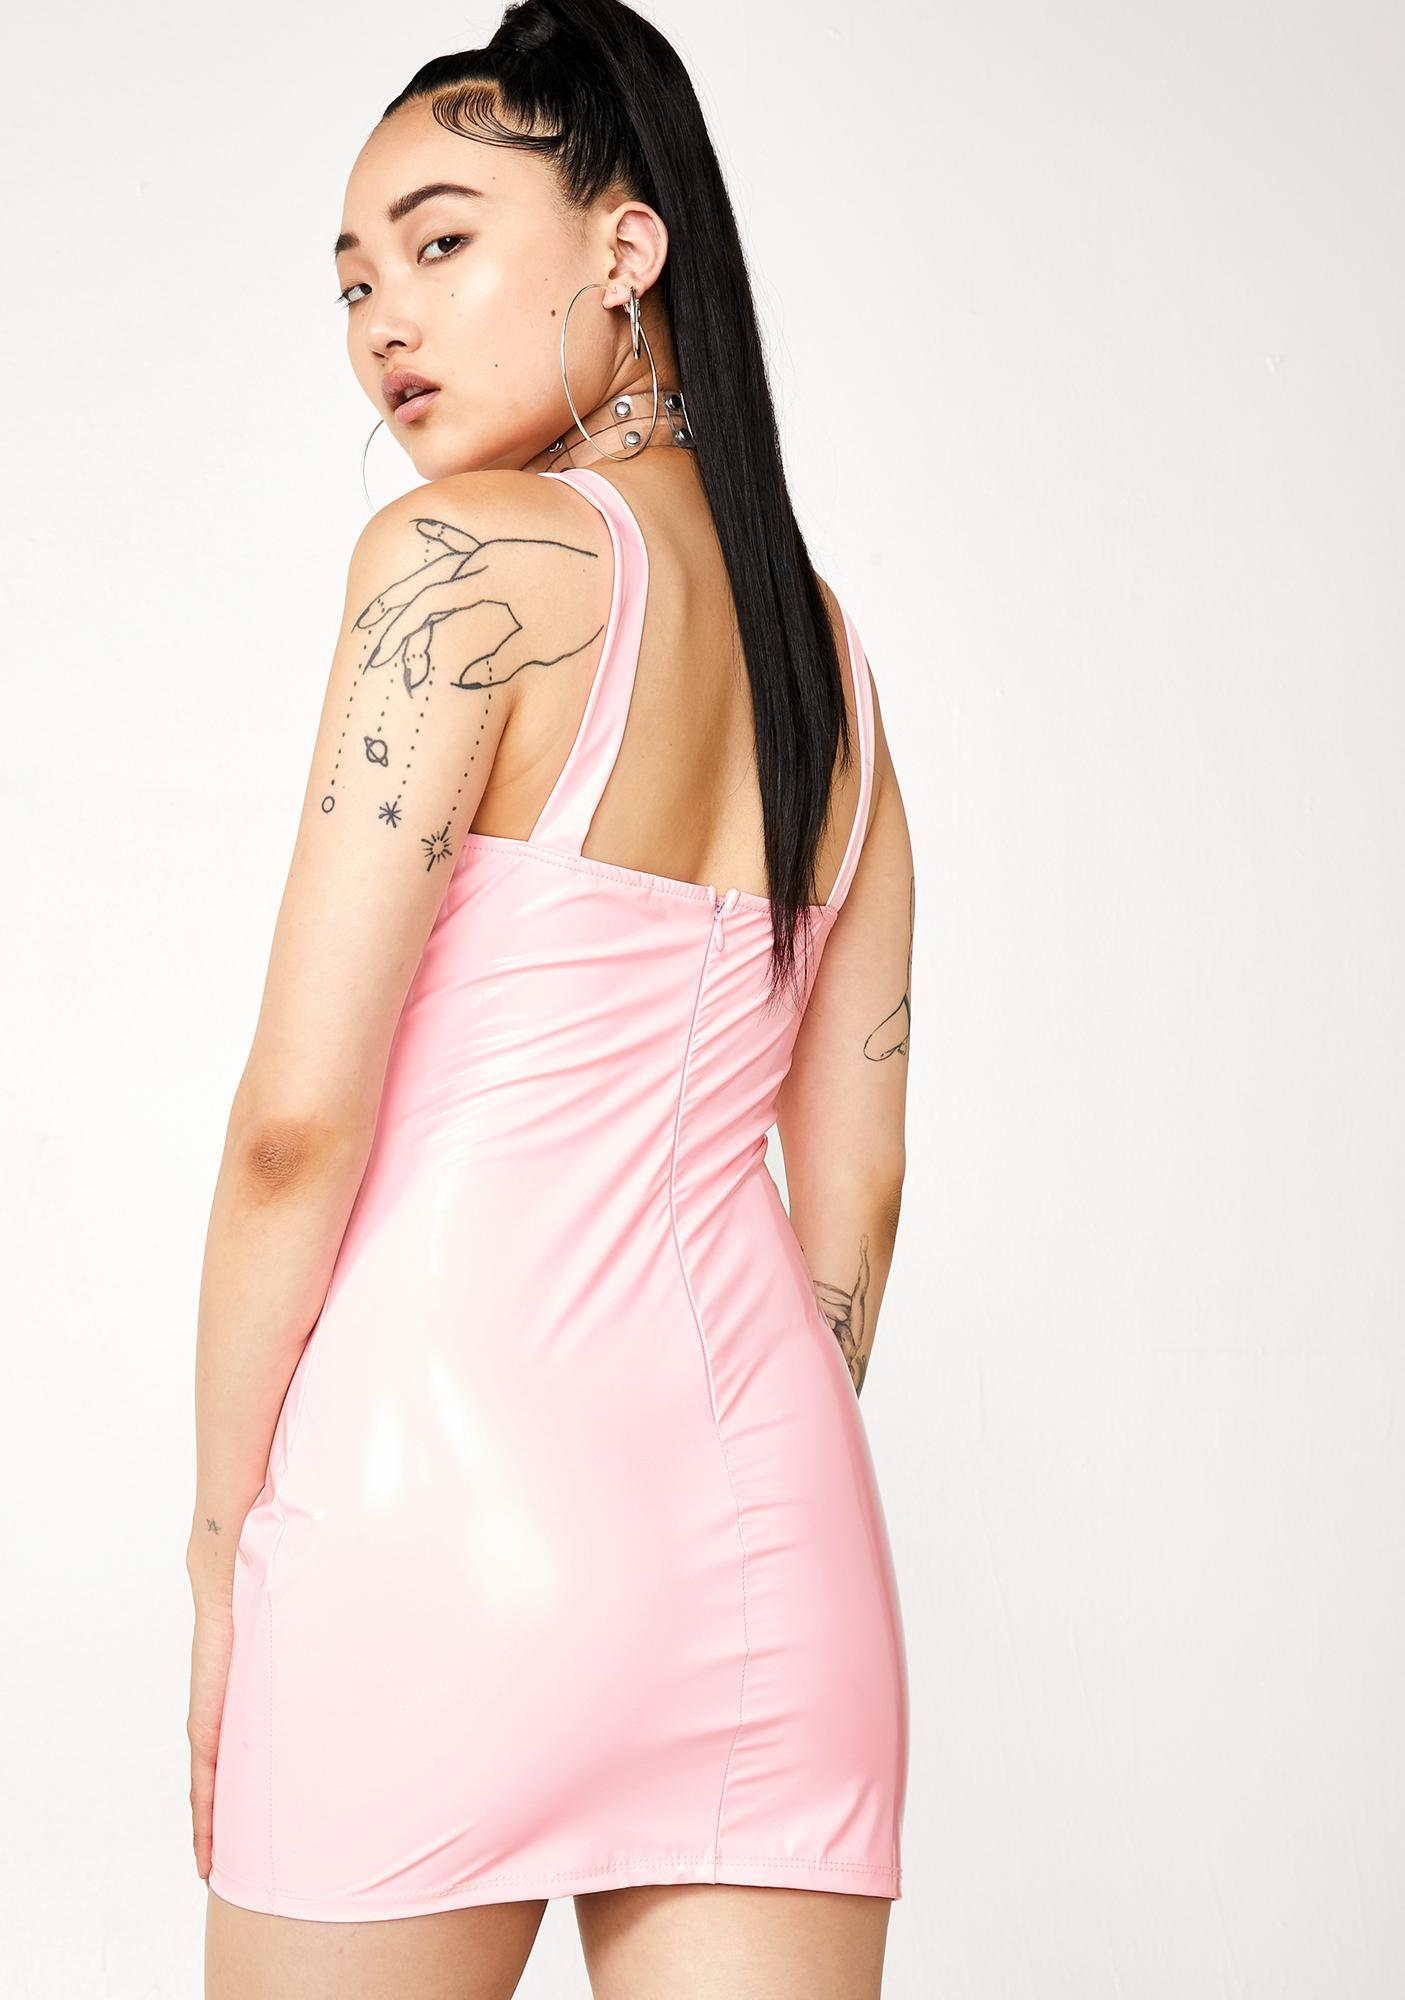 Blush Megathotzz Vinyl Mini Dress